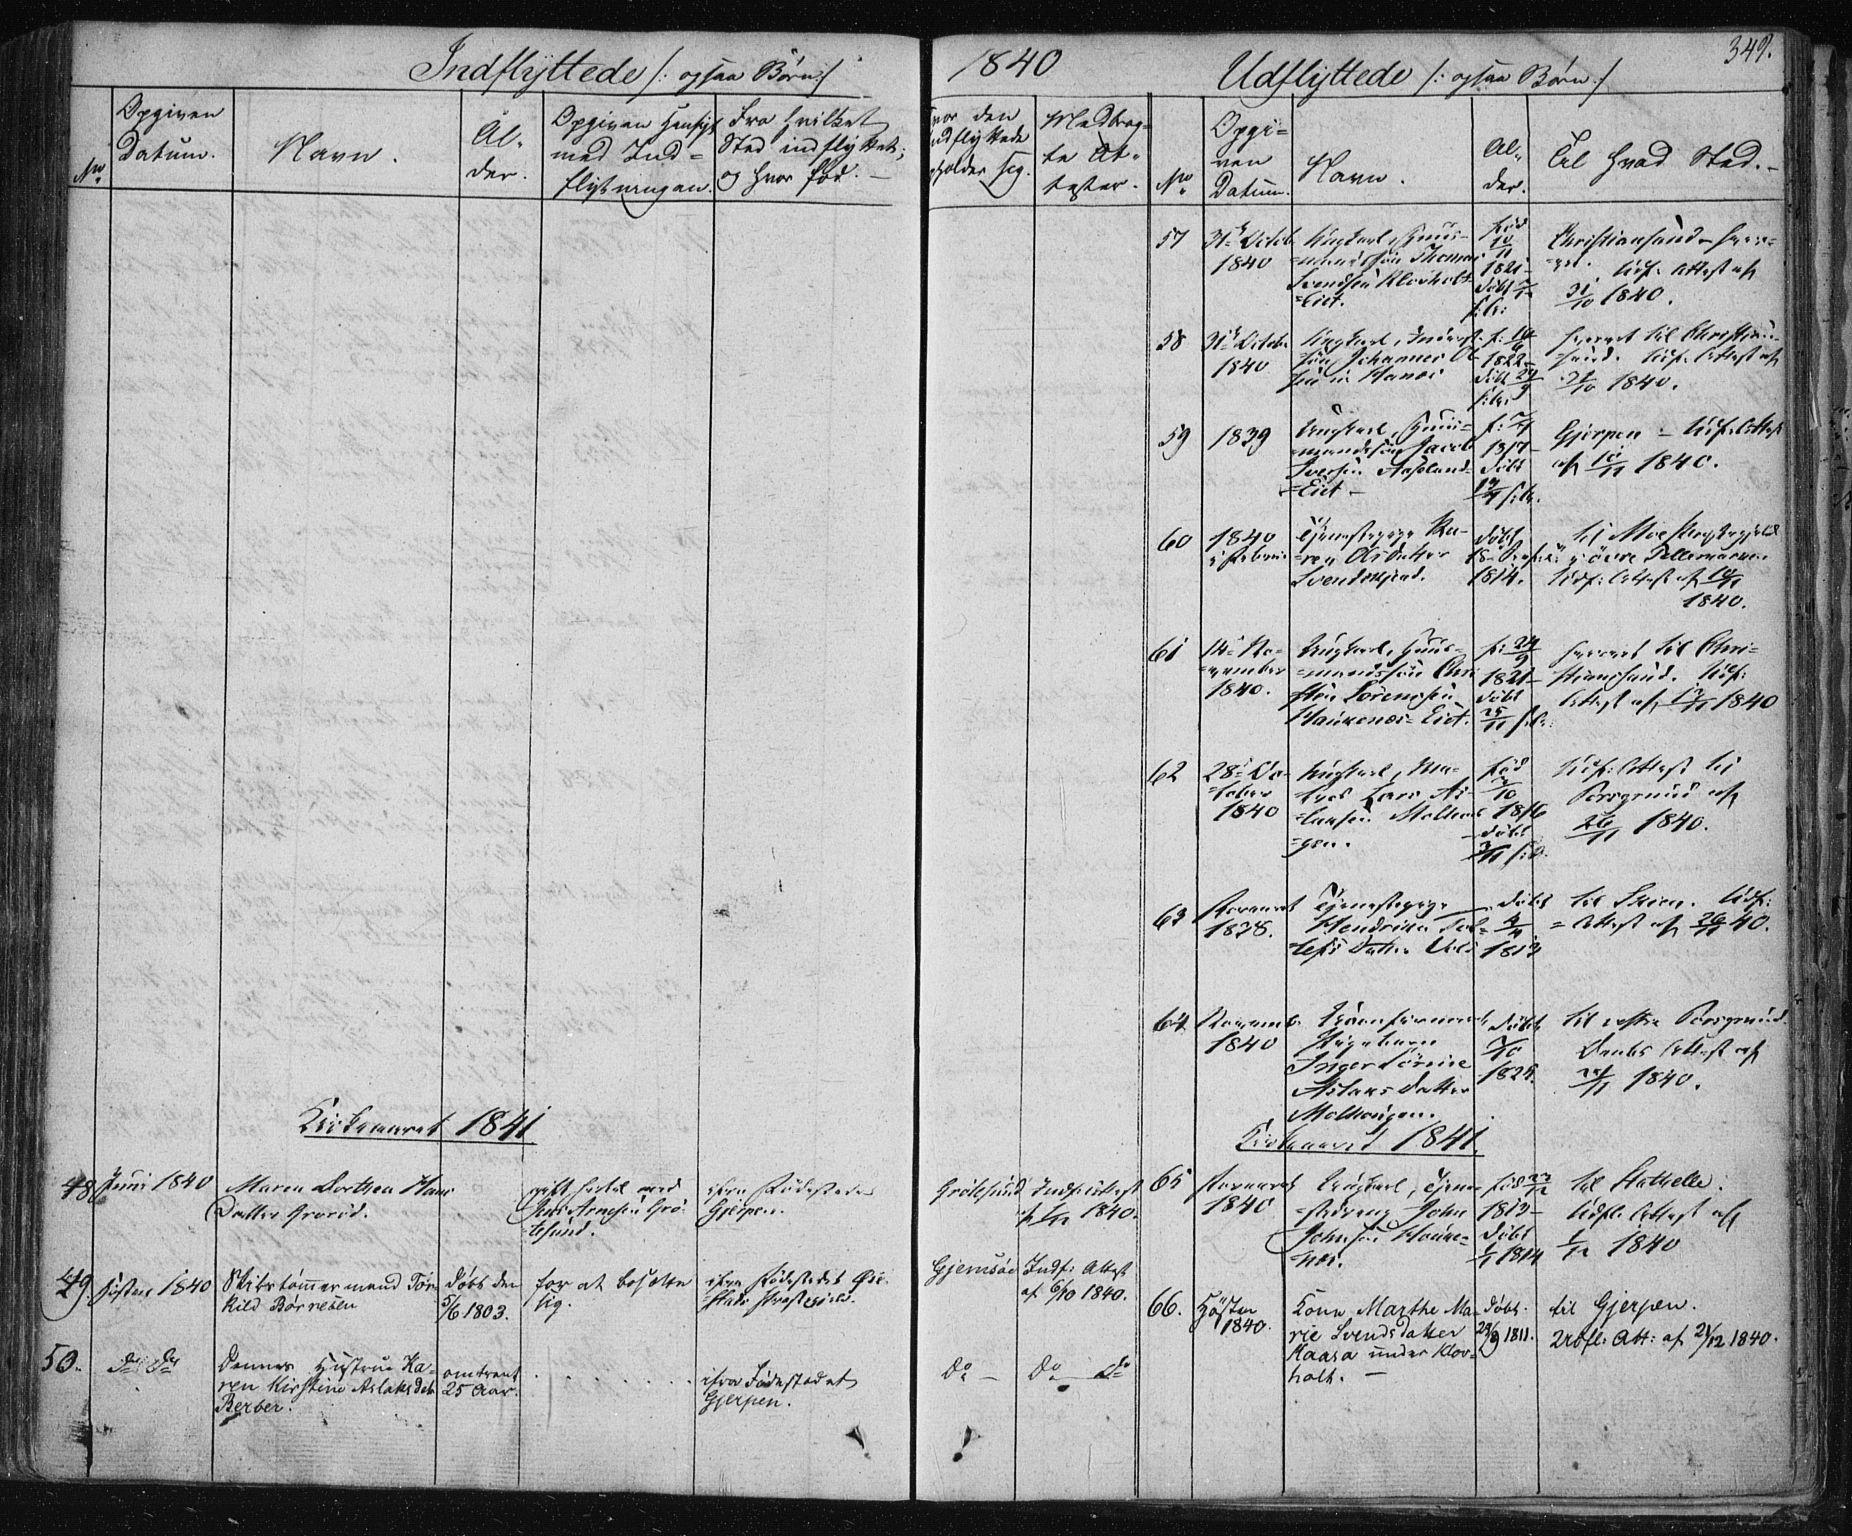 SAKO, Solum kirkebøker, F/Fa/L0005: Ministerialbok nr. I 5, 1833-1843, s. 349